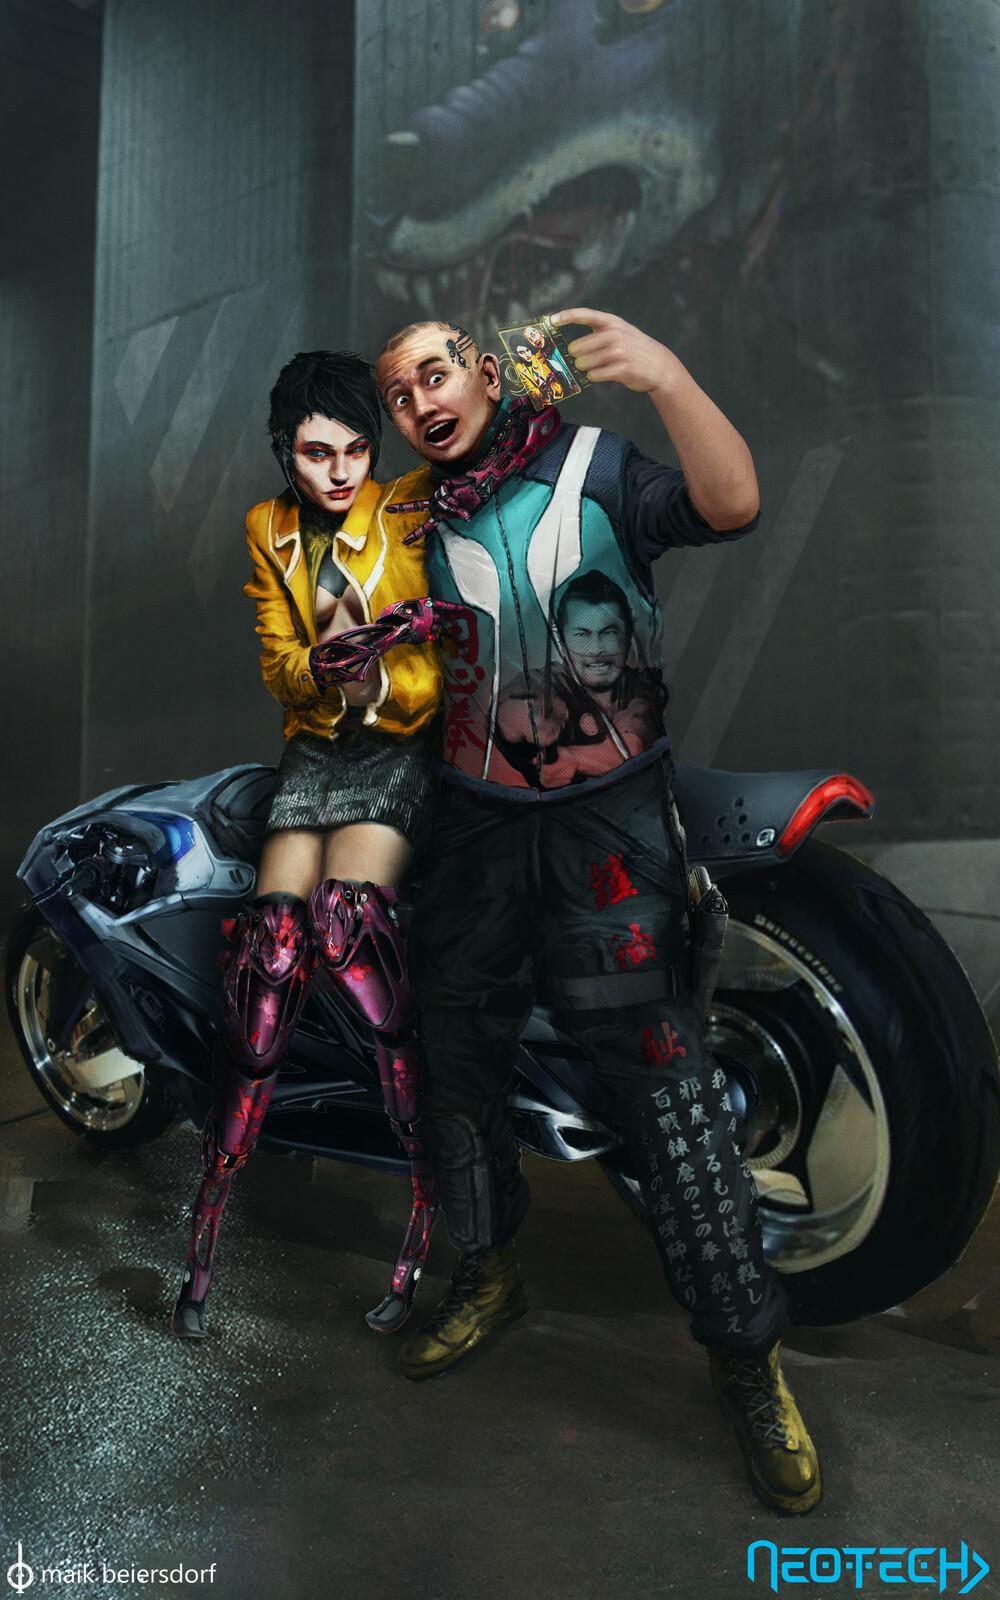 Neotech - Cyberpunk Subcultures